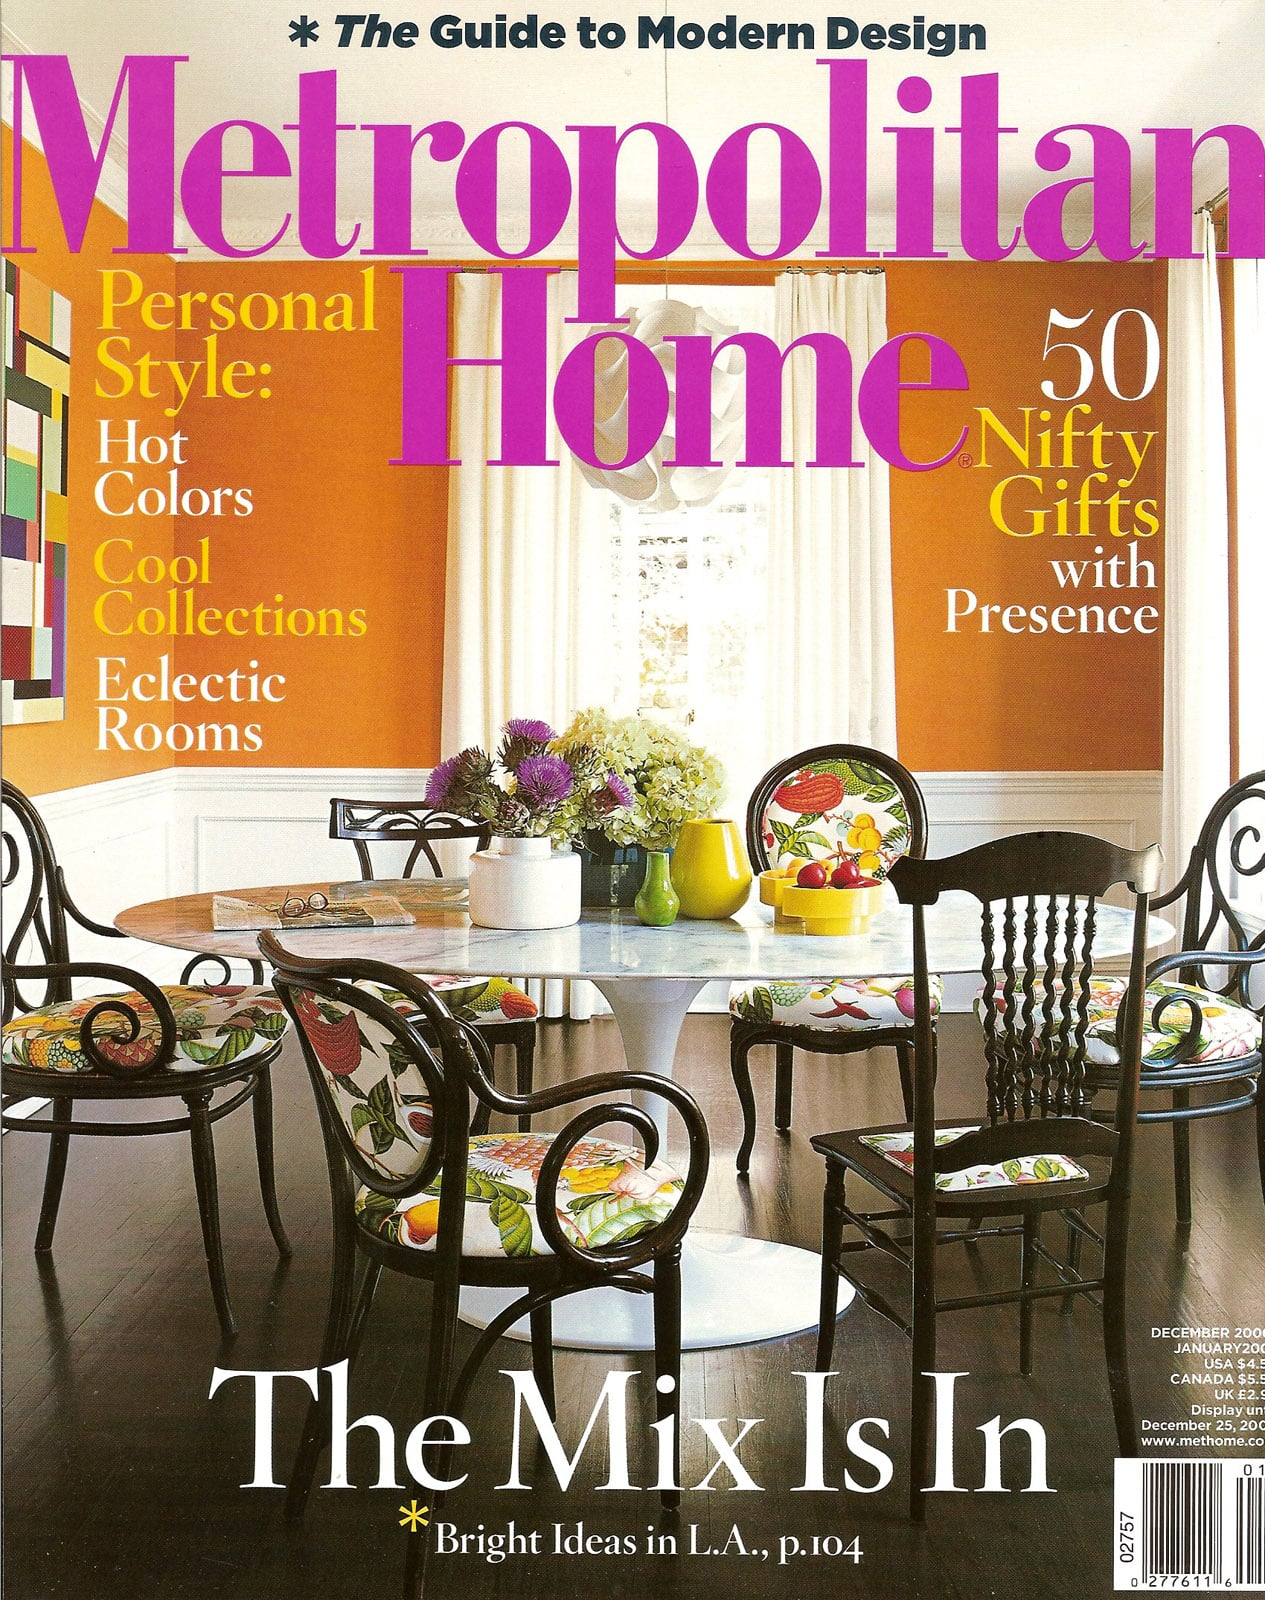 06_12_metropolitan_home_0106_cover.jpg